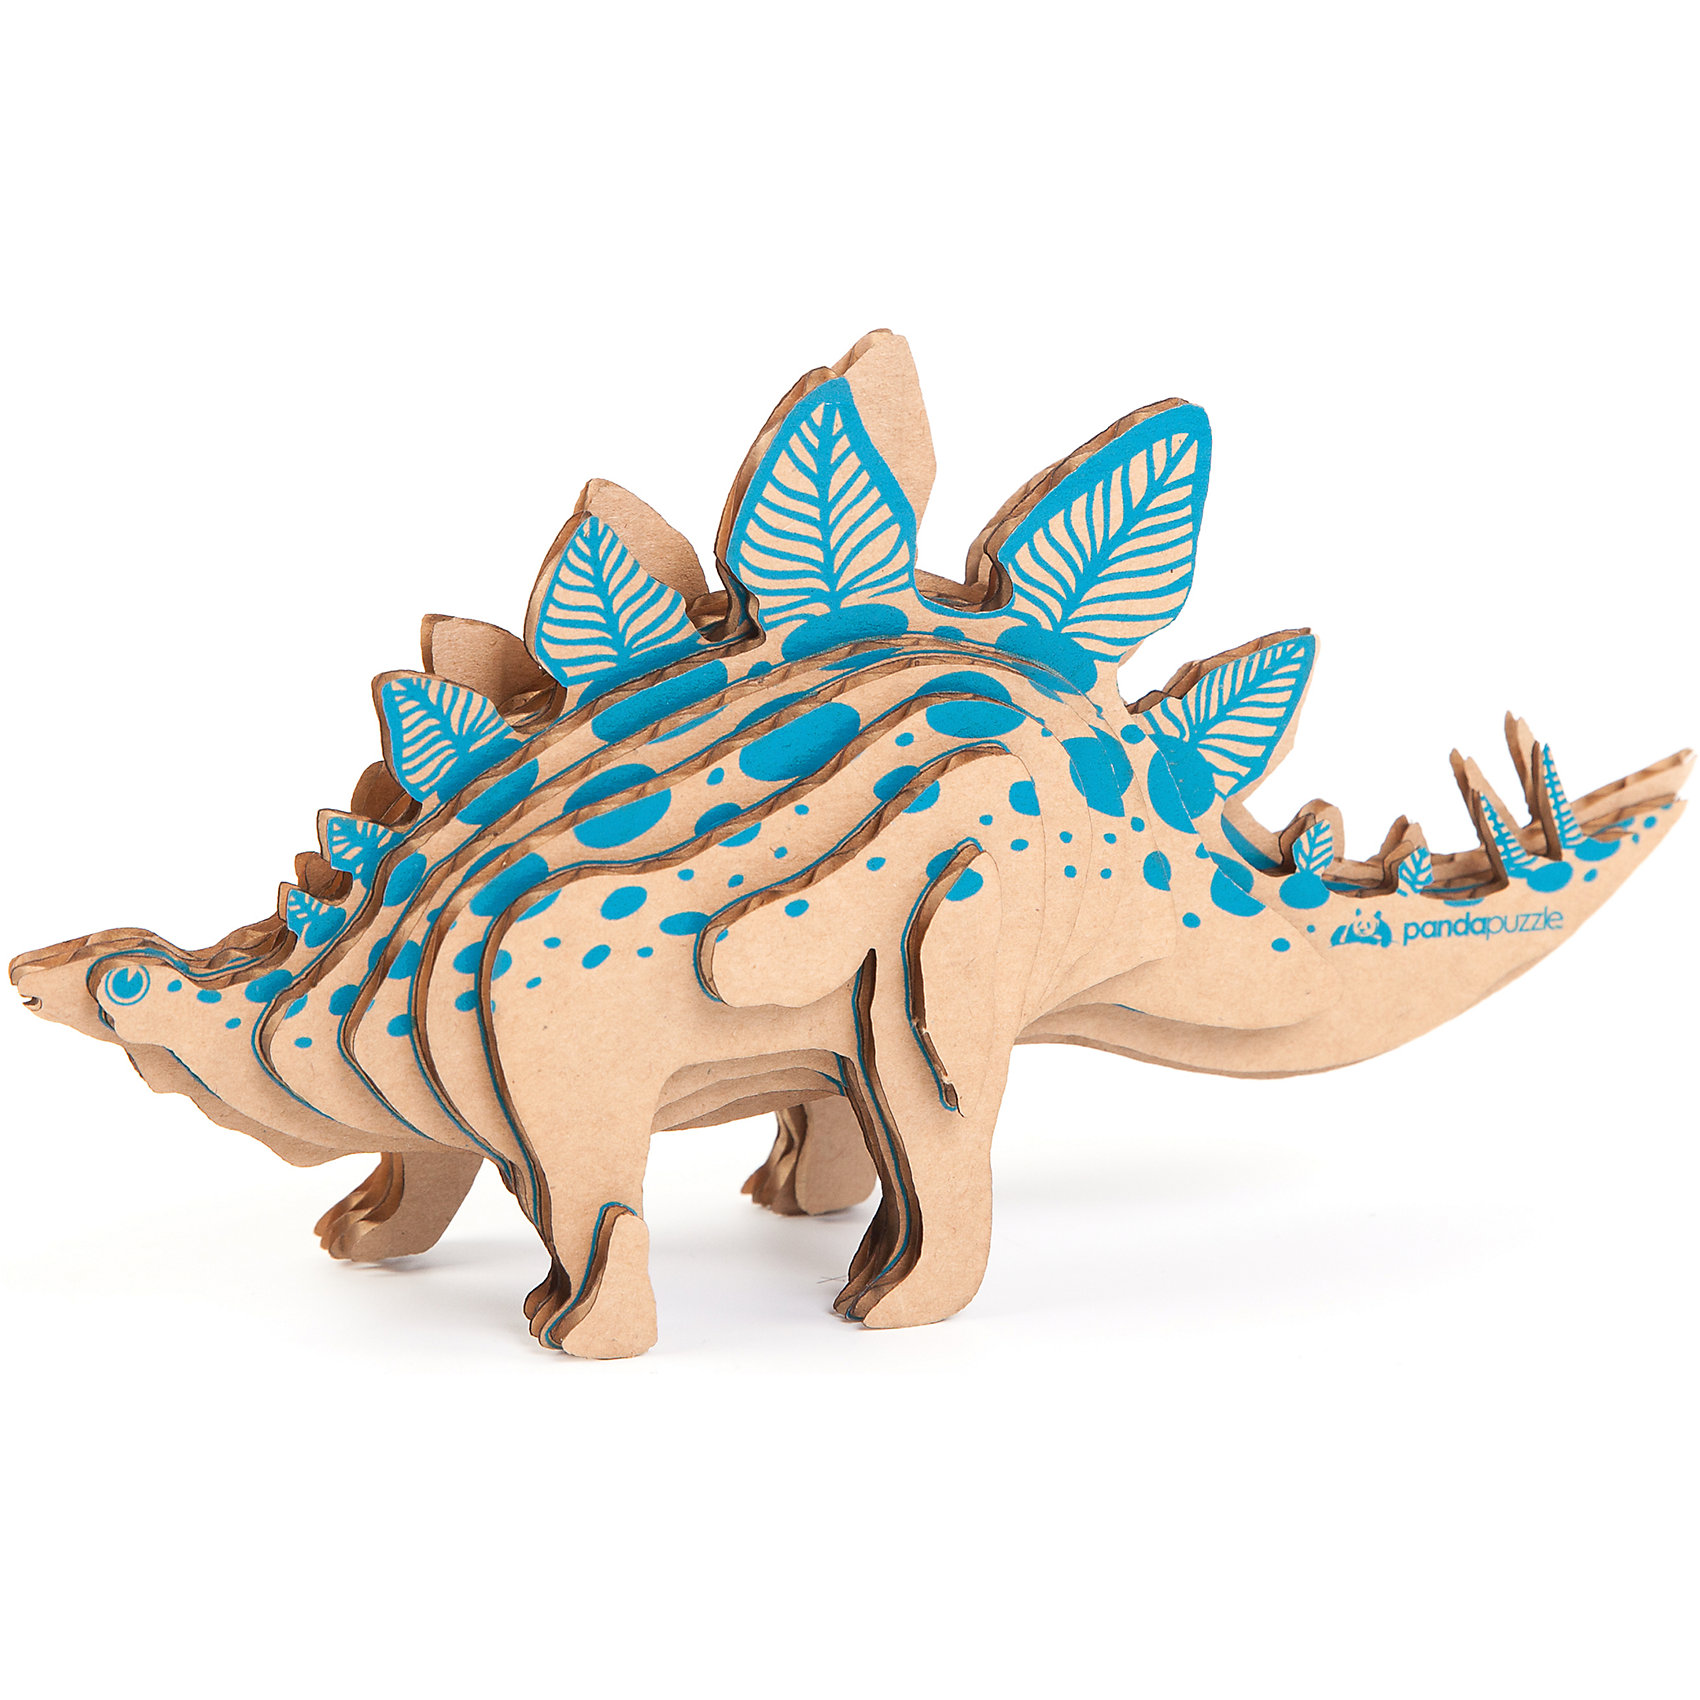 3D-Пазл «Стегозавр», PandaPuzzle